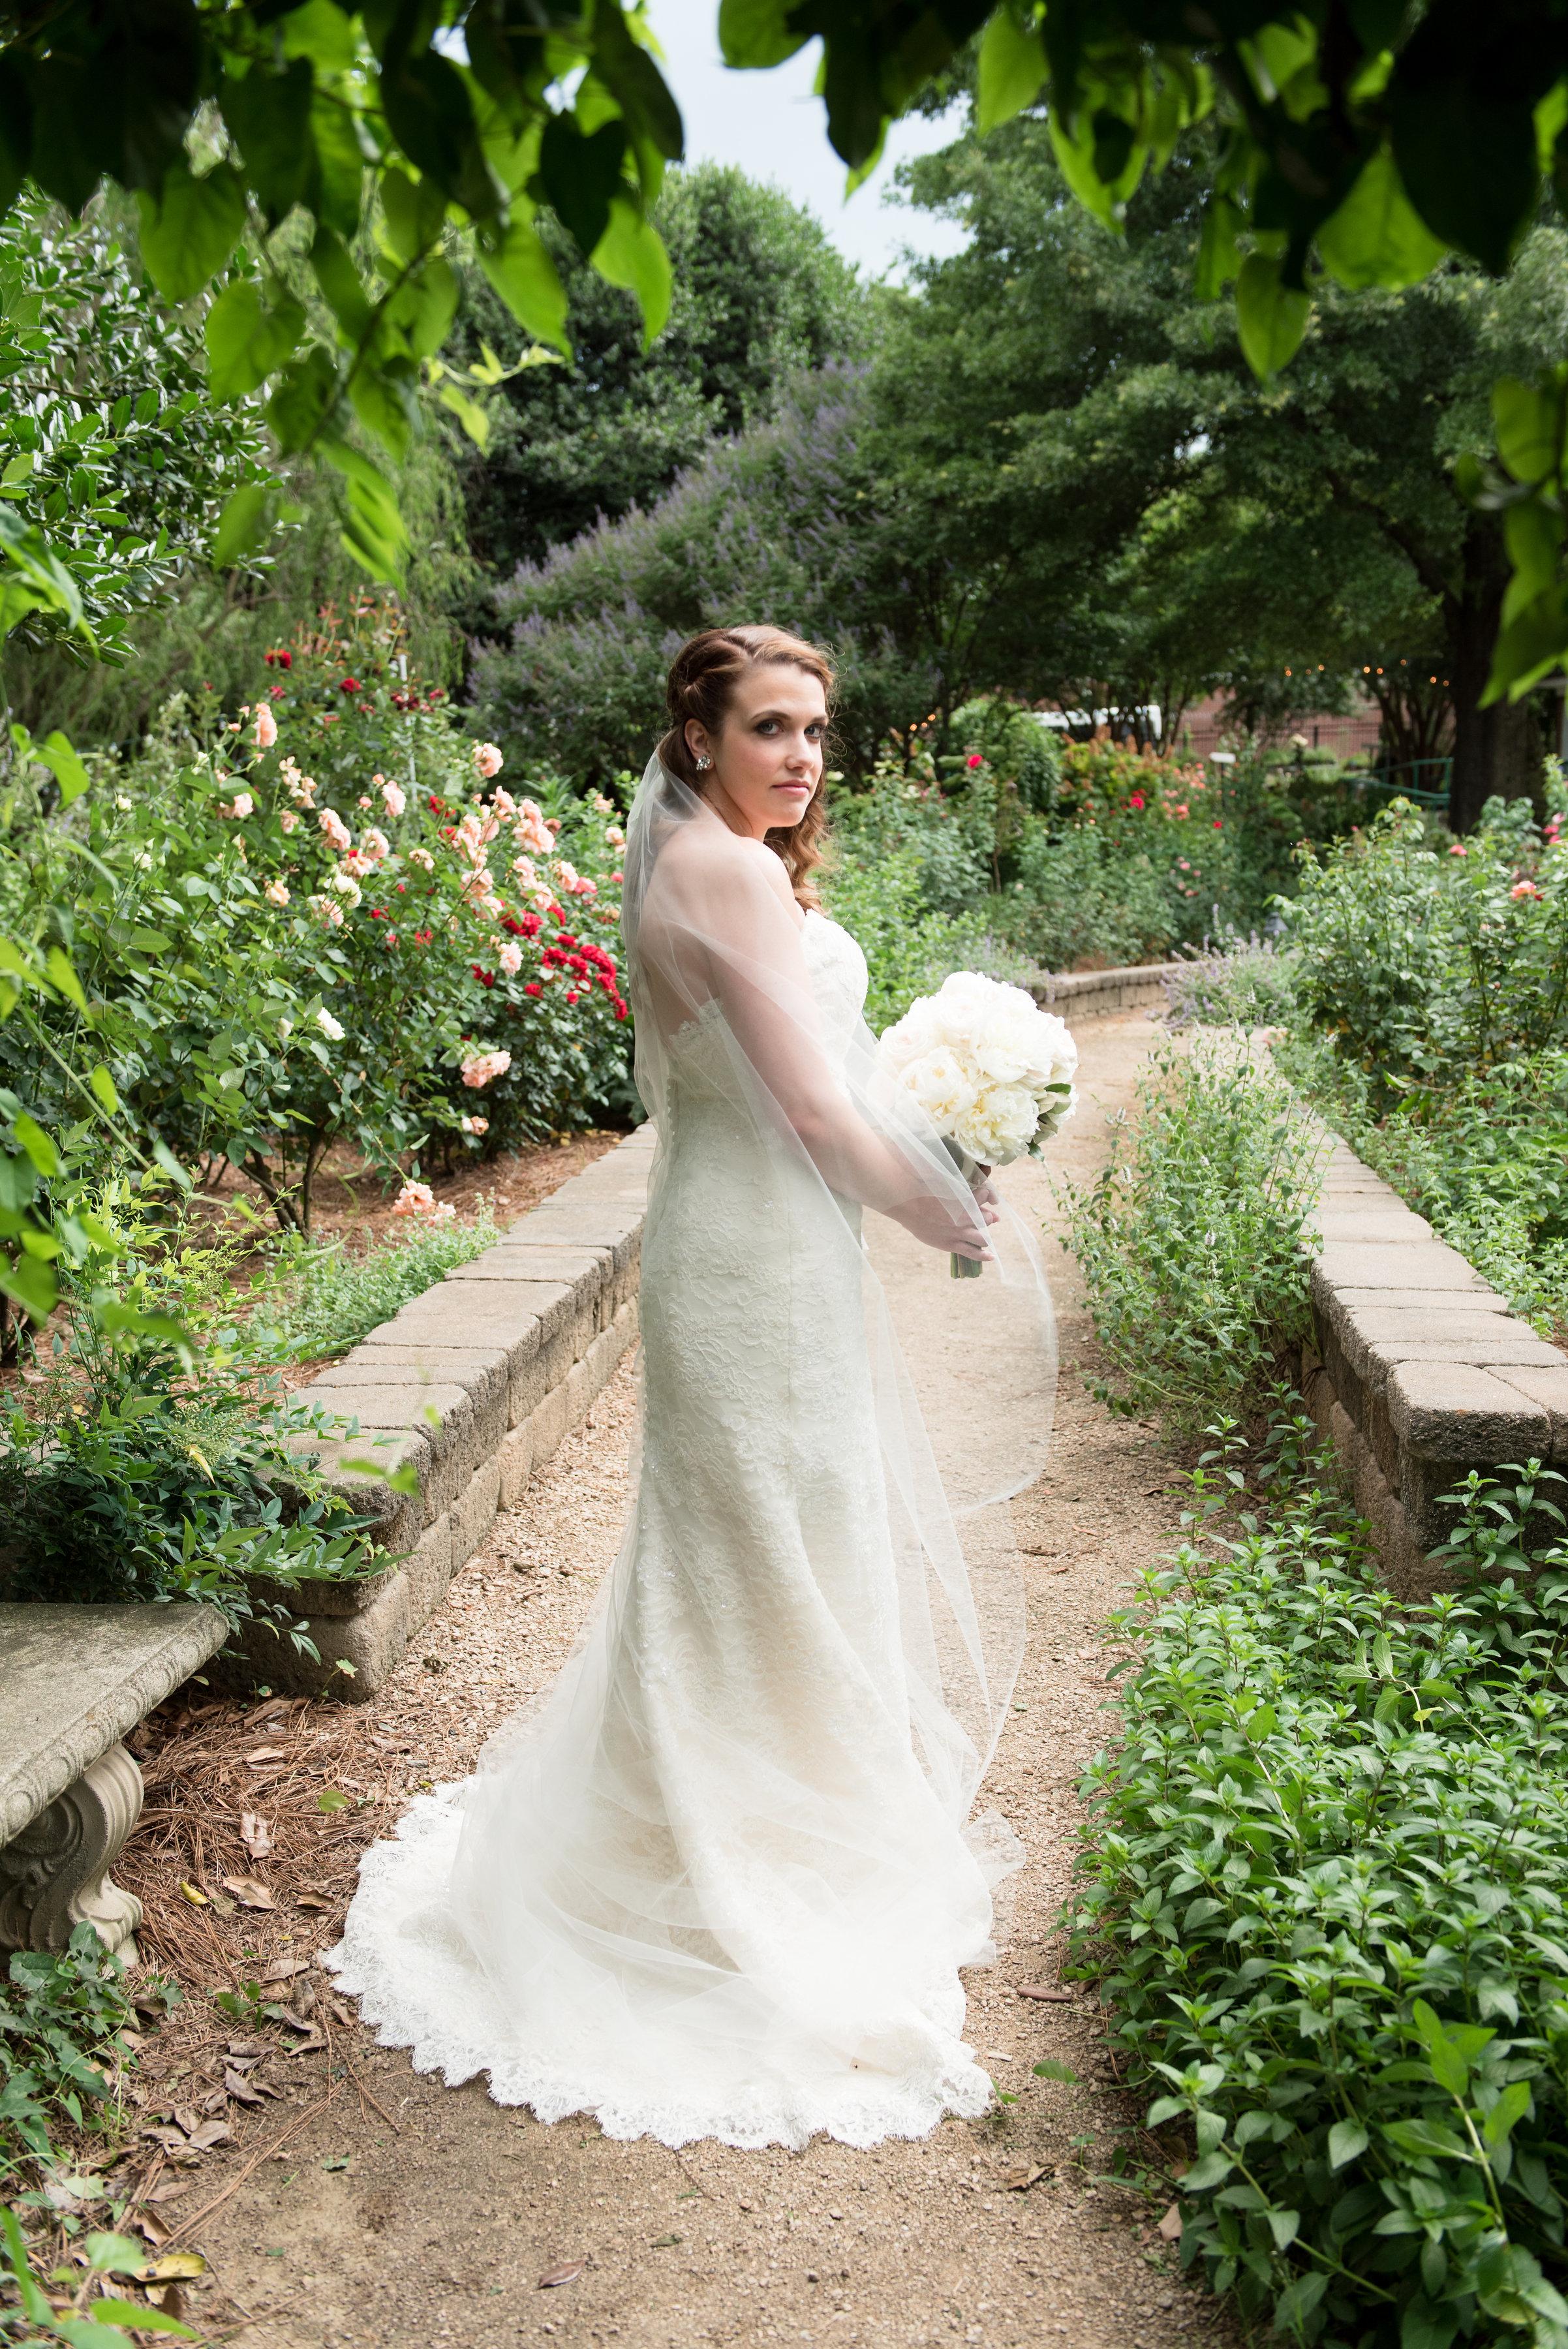 mcgill-rose-garden-bridal-portraits-29.jpg